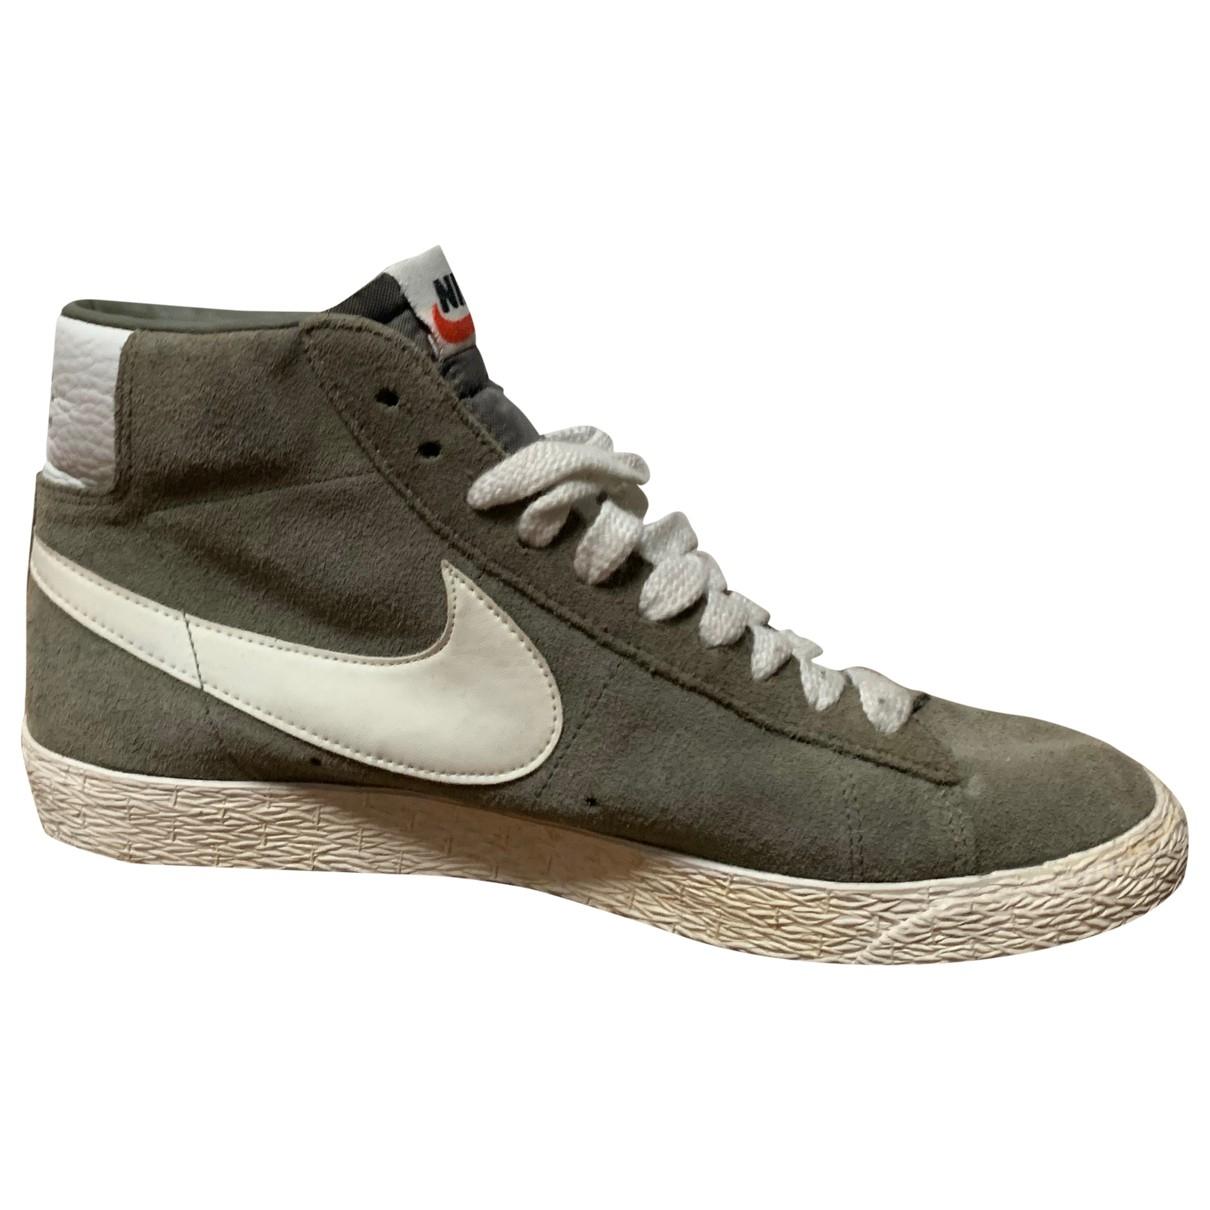 Nike - Baskets Blazer pour homme en suede - vert